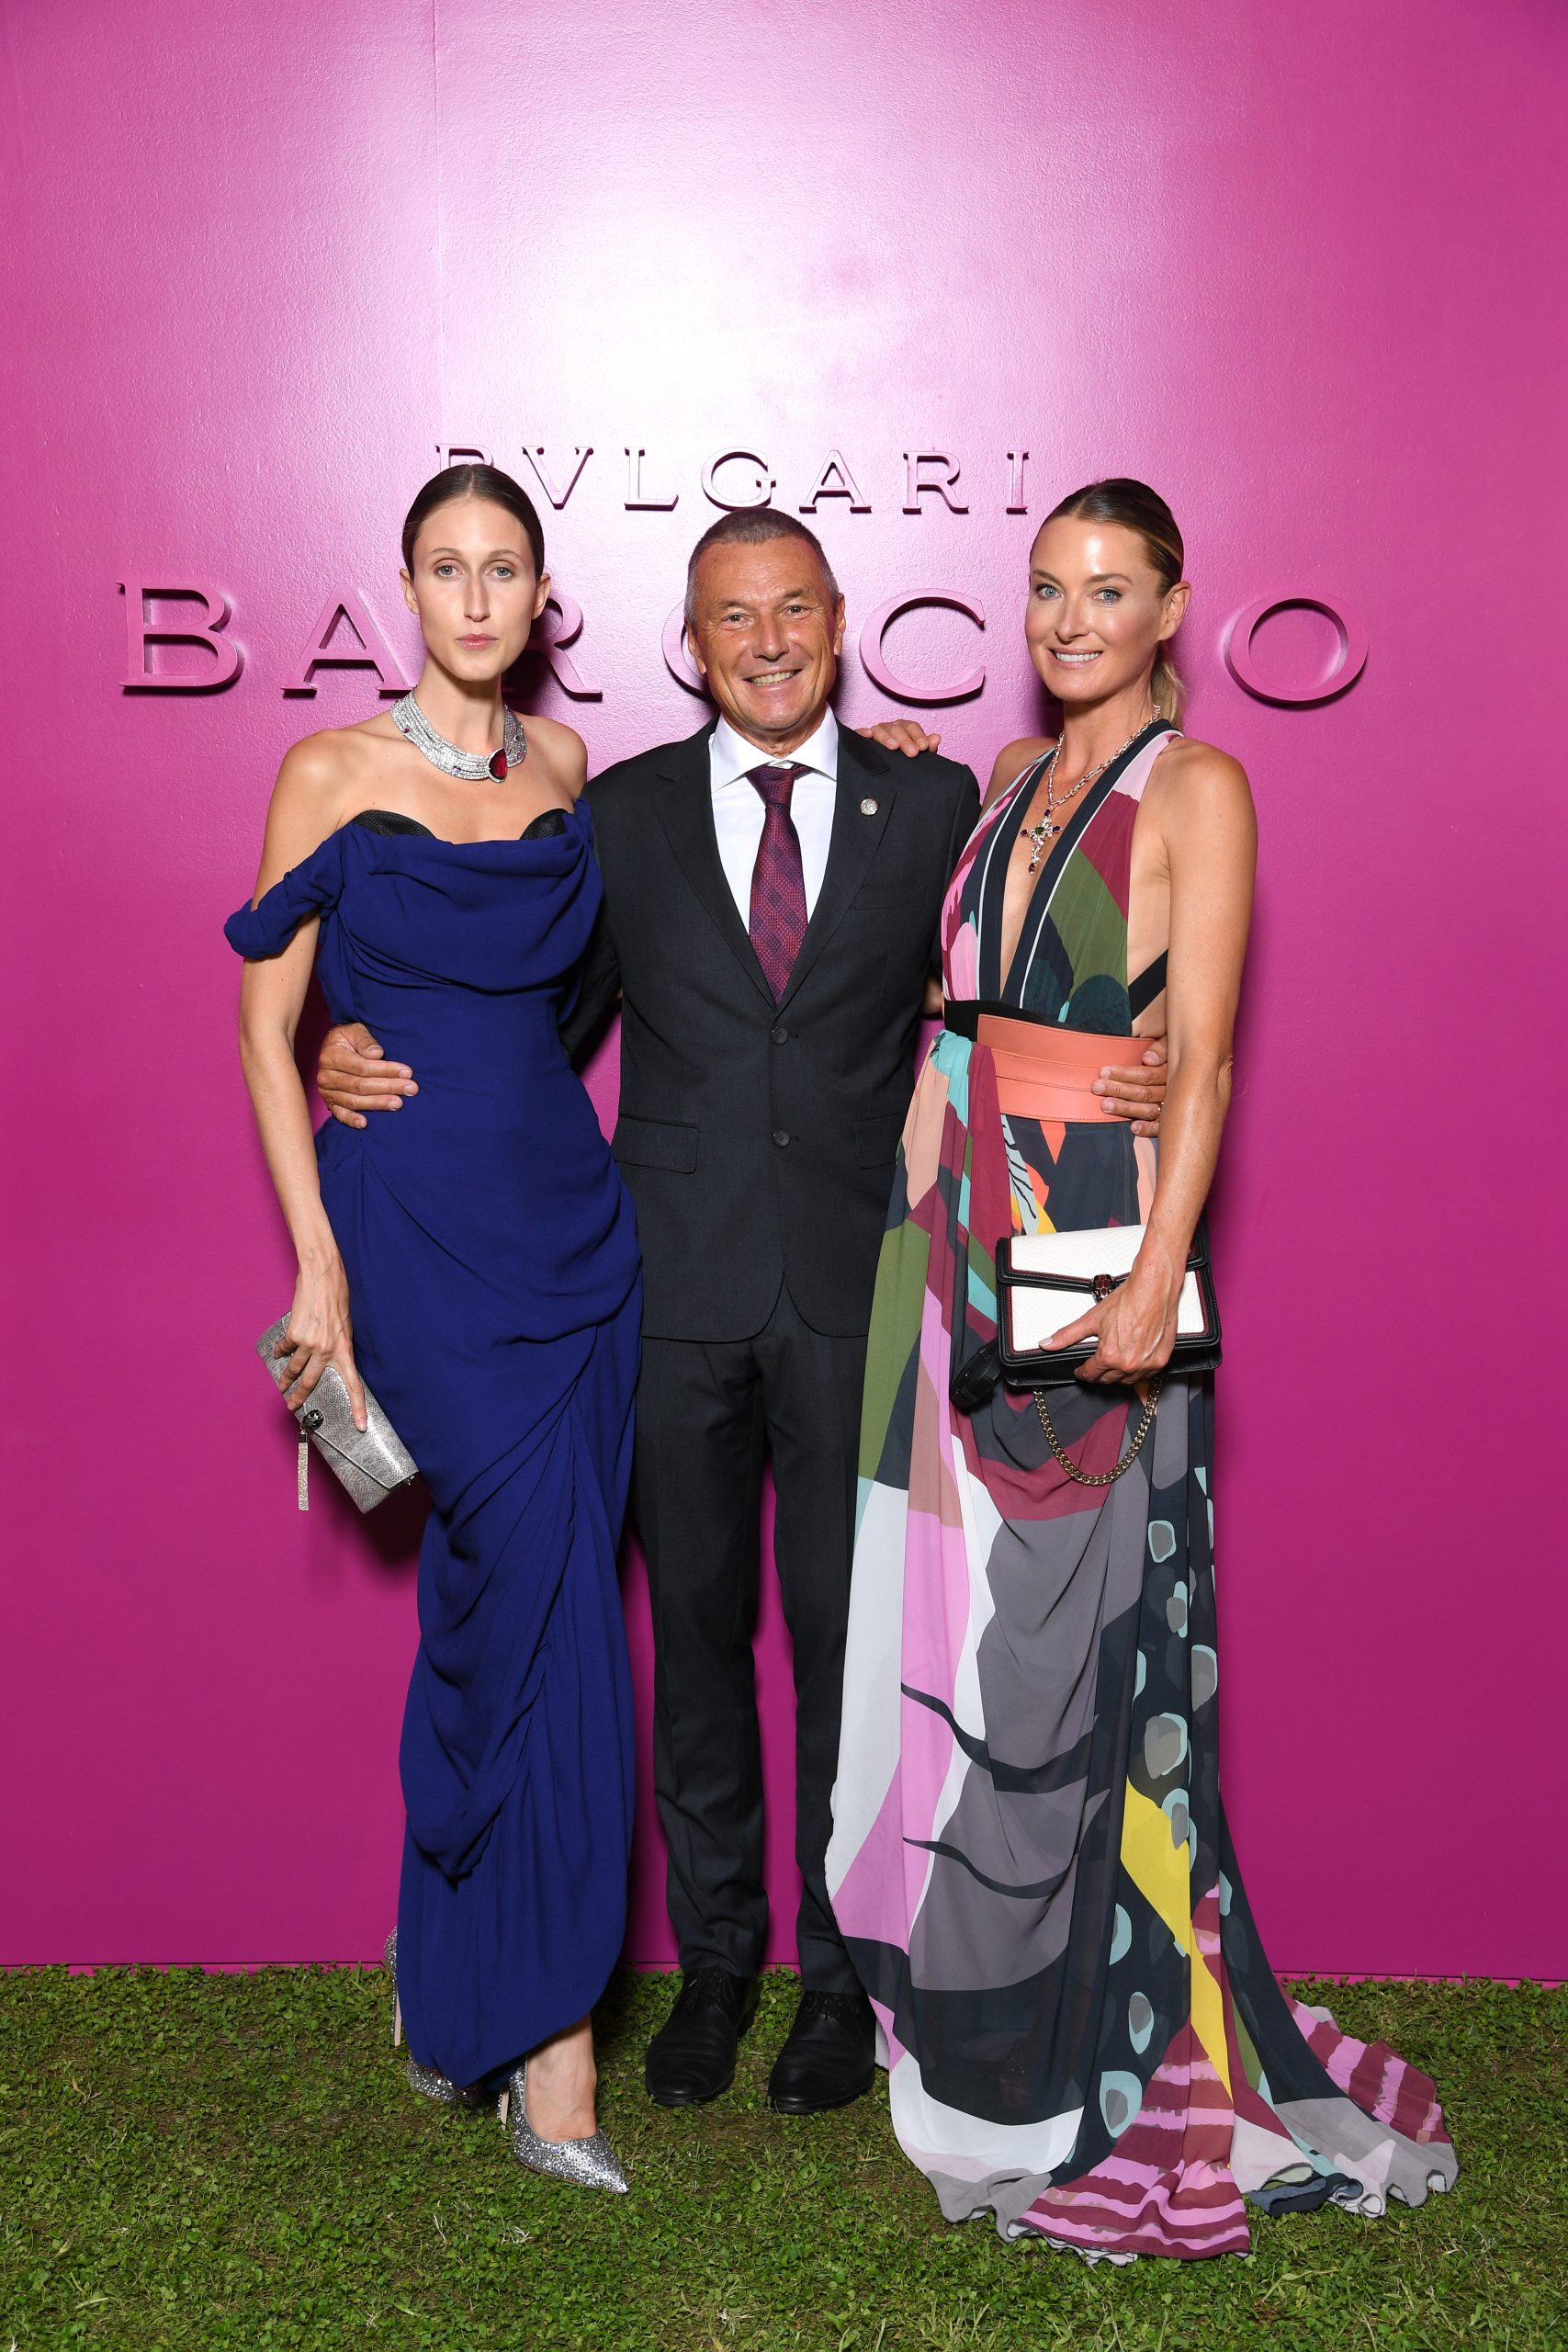 В духе барокко: Тина Кунаки, Китти Спенсер и Поппи Делевинь на показе Bvlgari в Риме